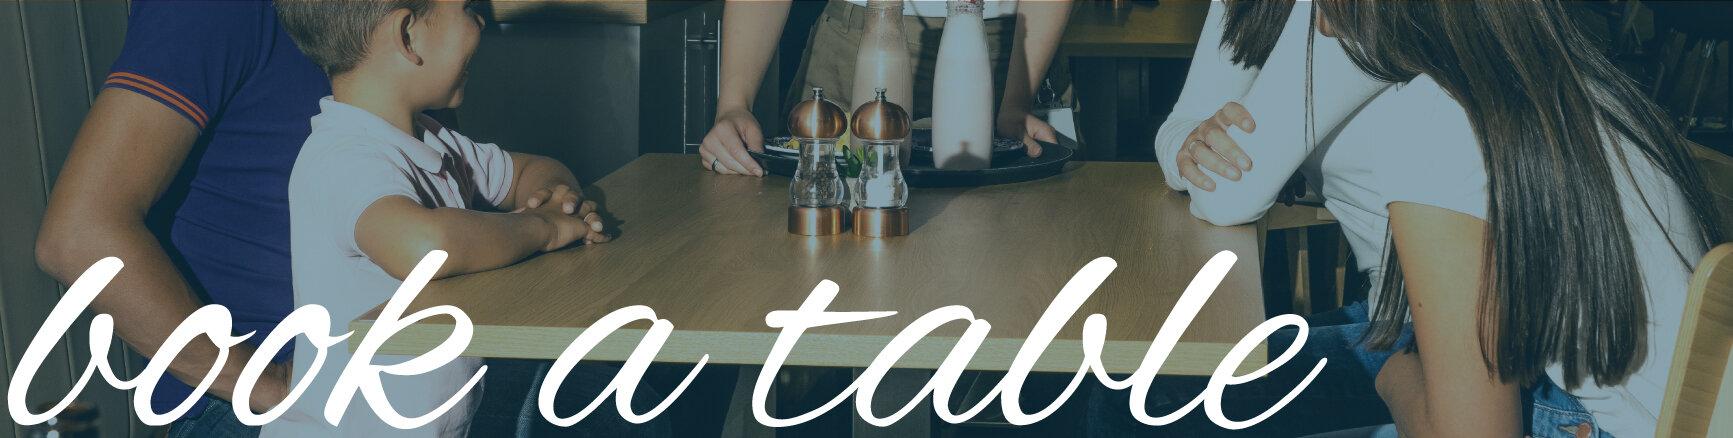 book-a-table-banner.jpg